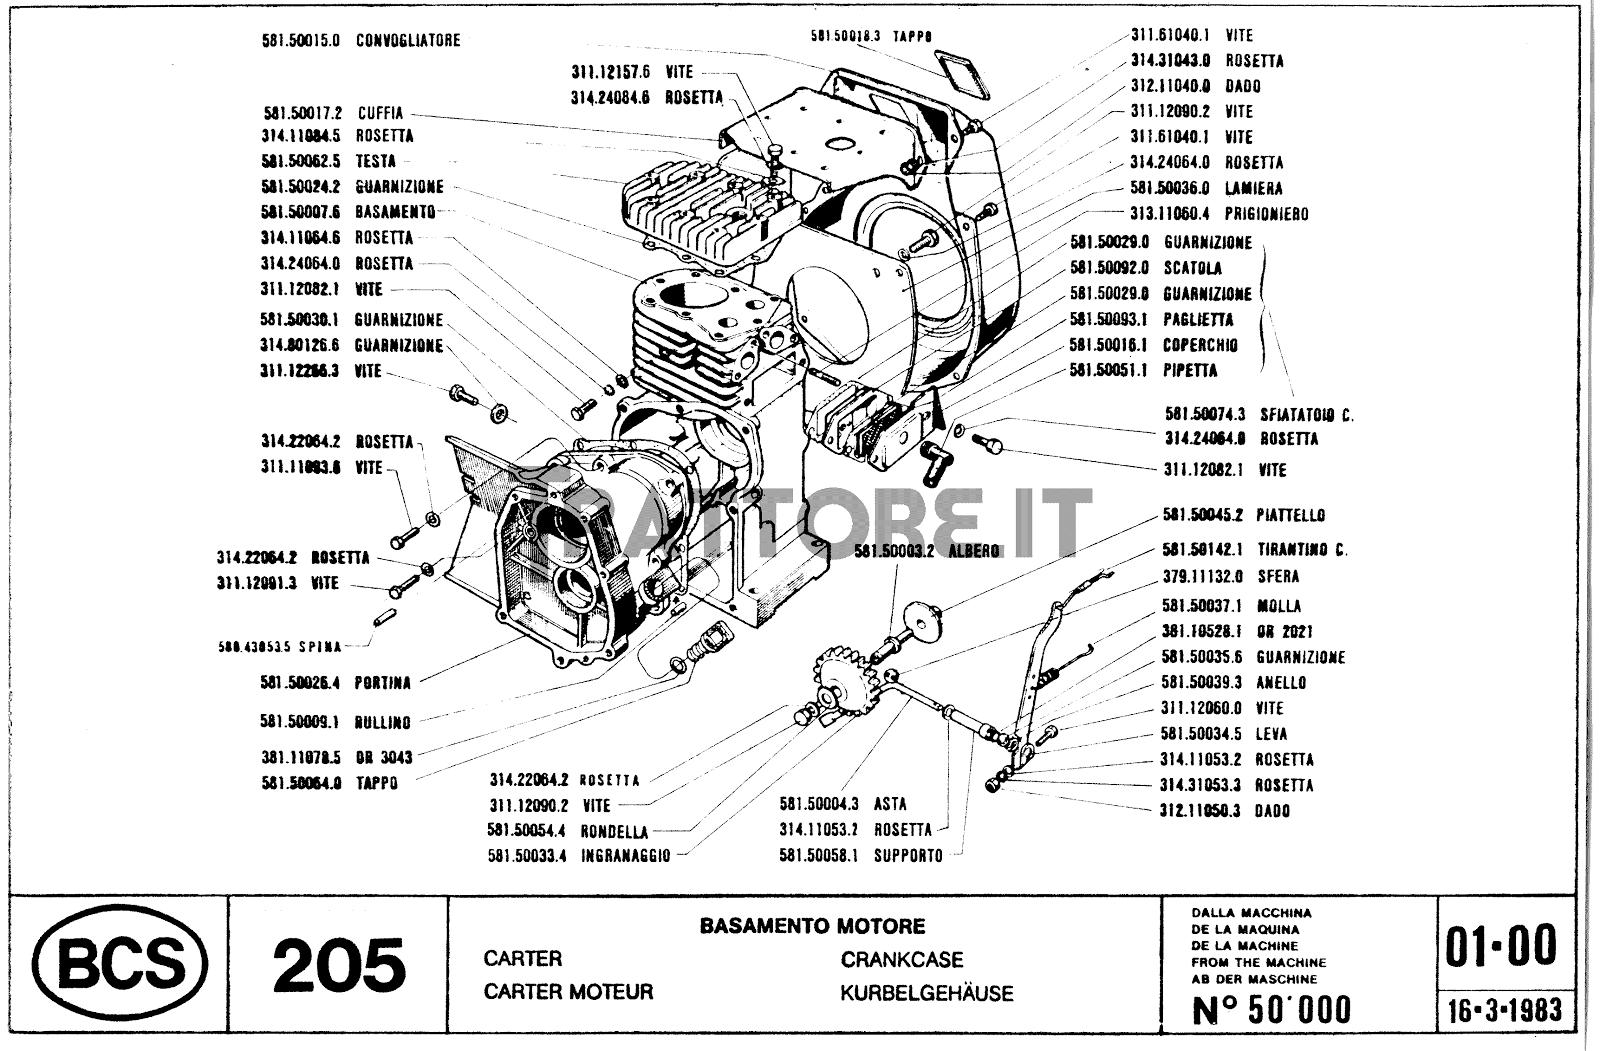 Bcs 205 caratteristiche